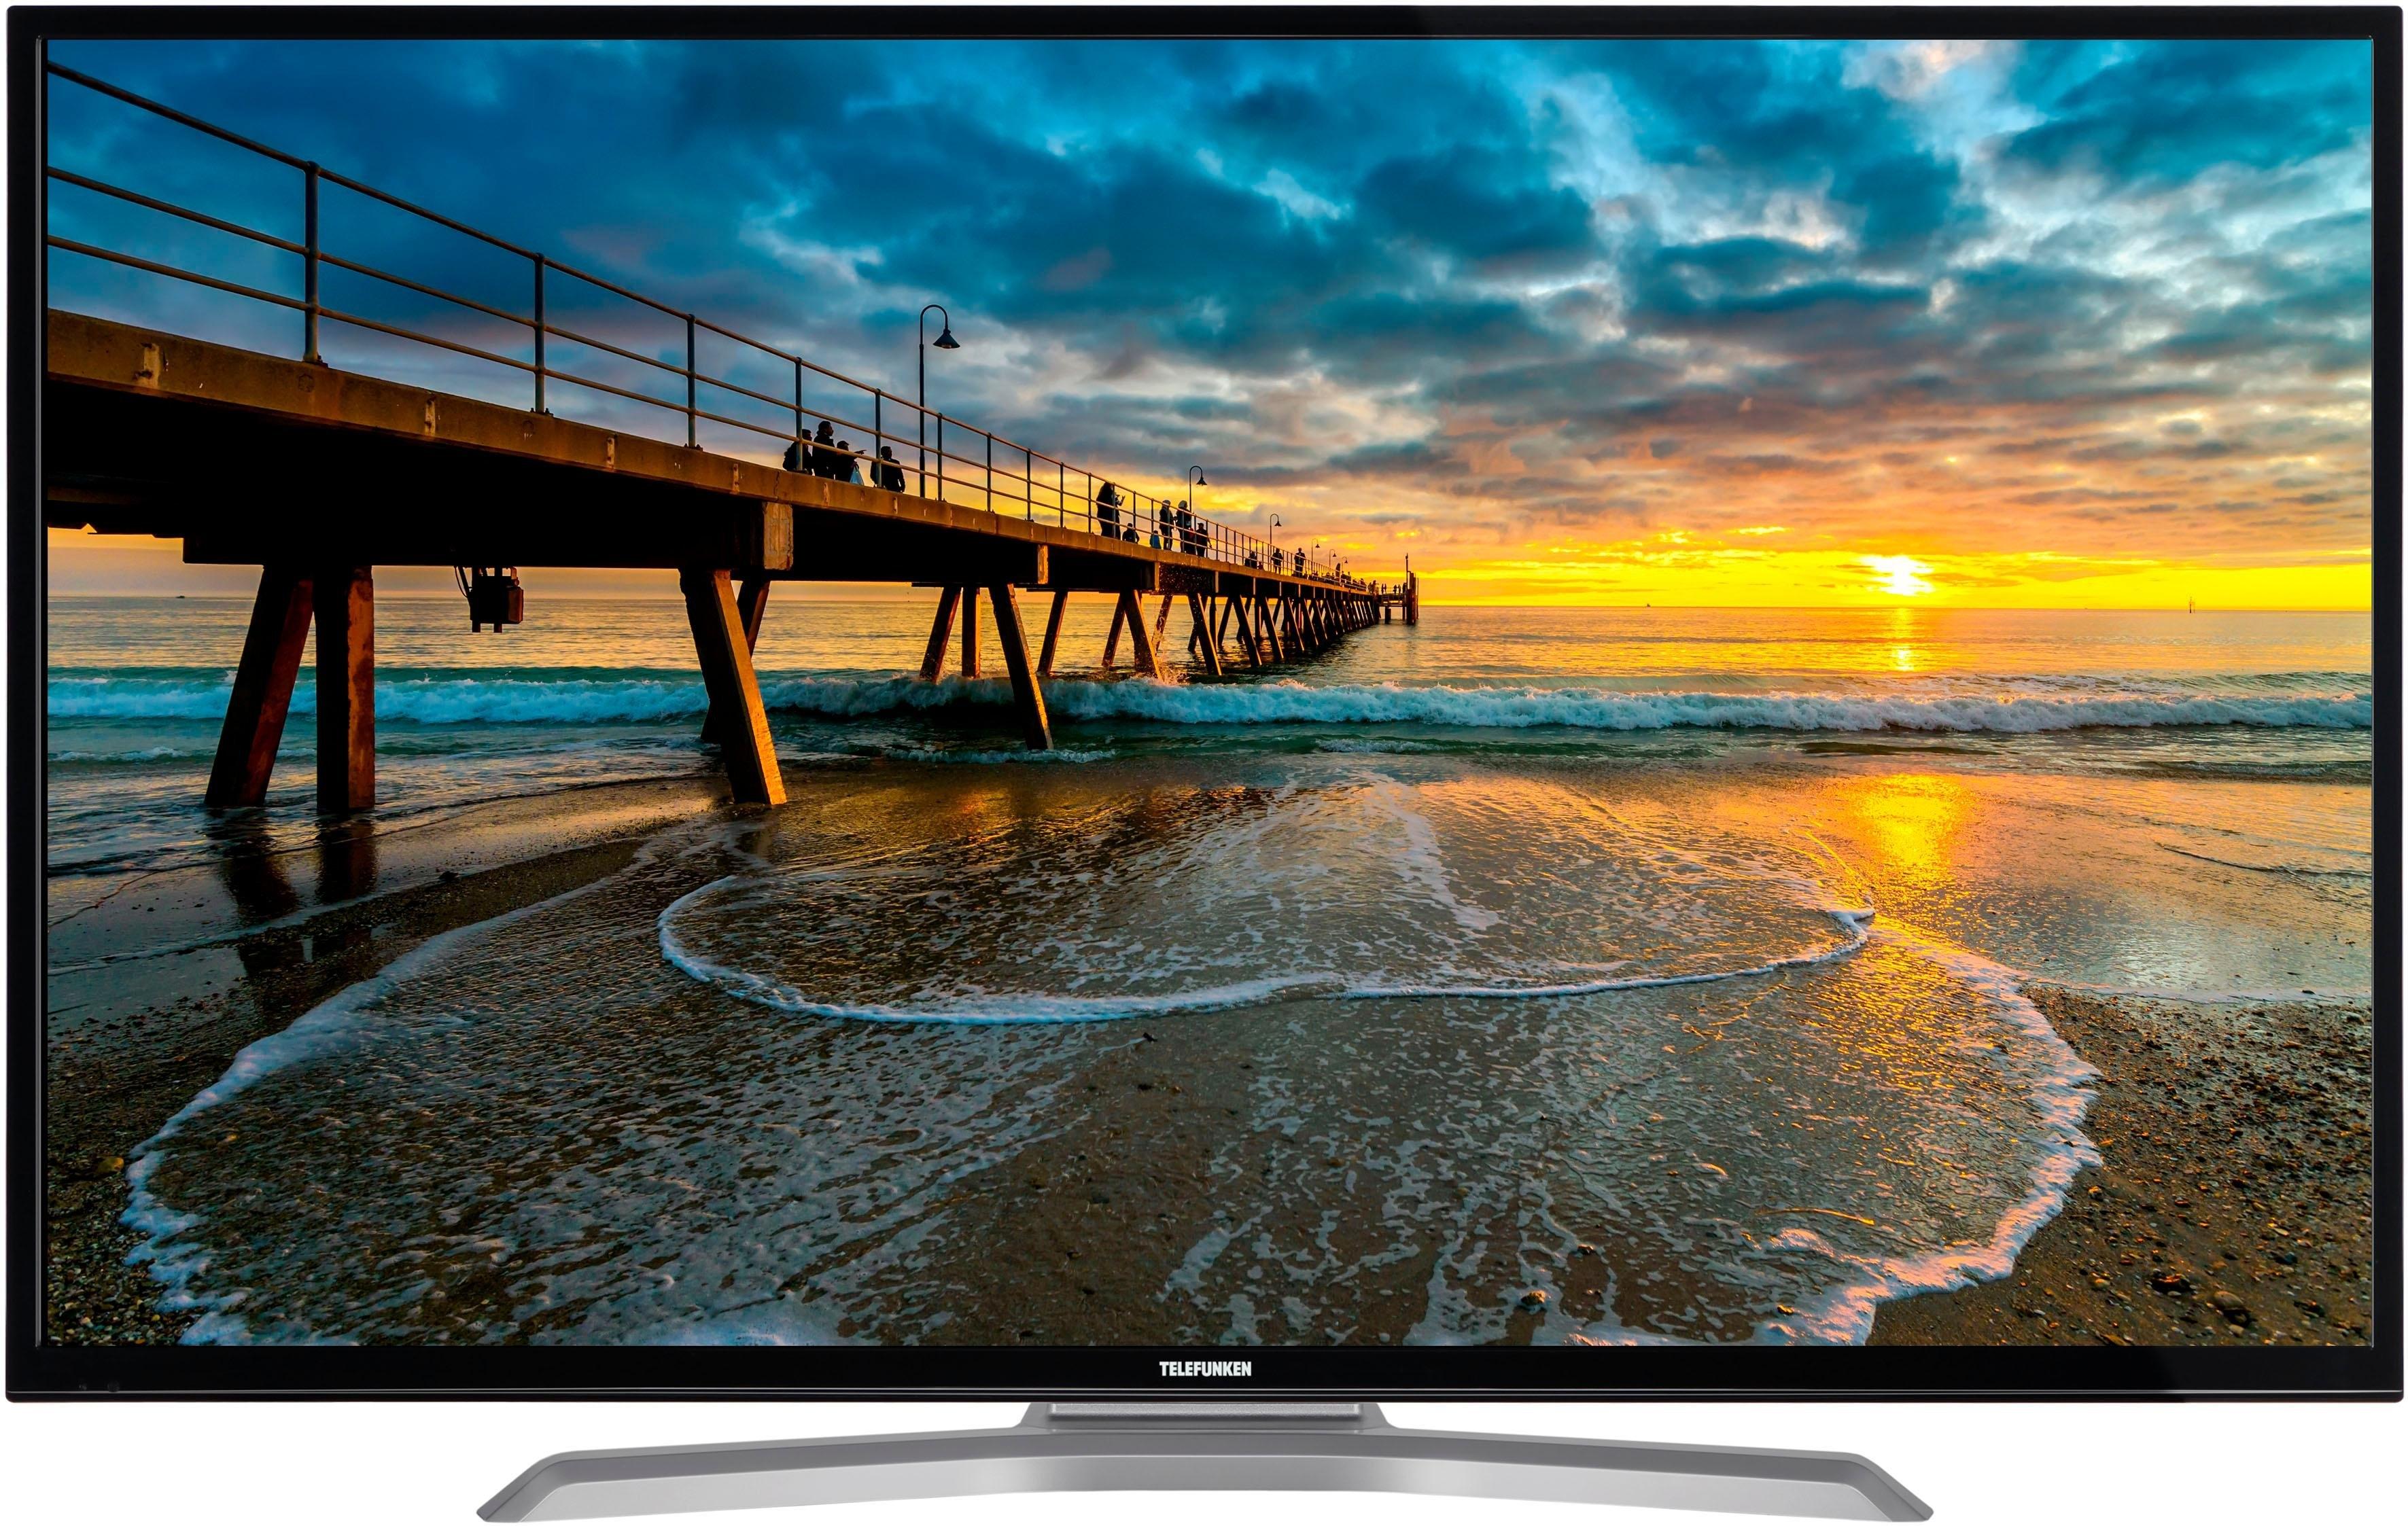 Telefunken D55U700M4CWH led-tv (55 inch), 4K Ultra HD, smart-tv veilig op otto.nl kopen